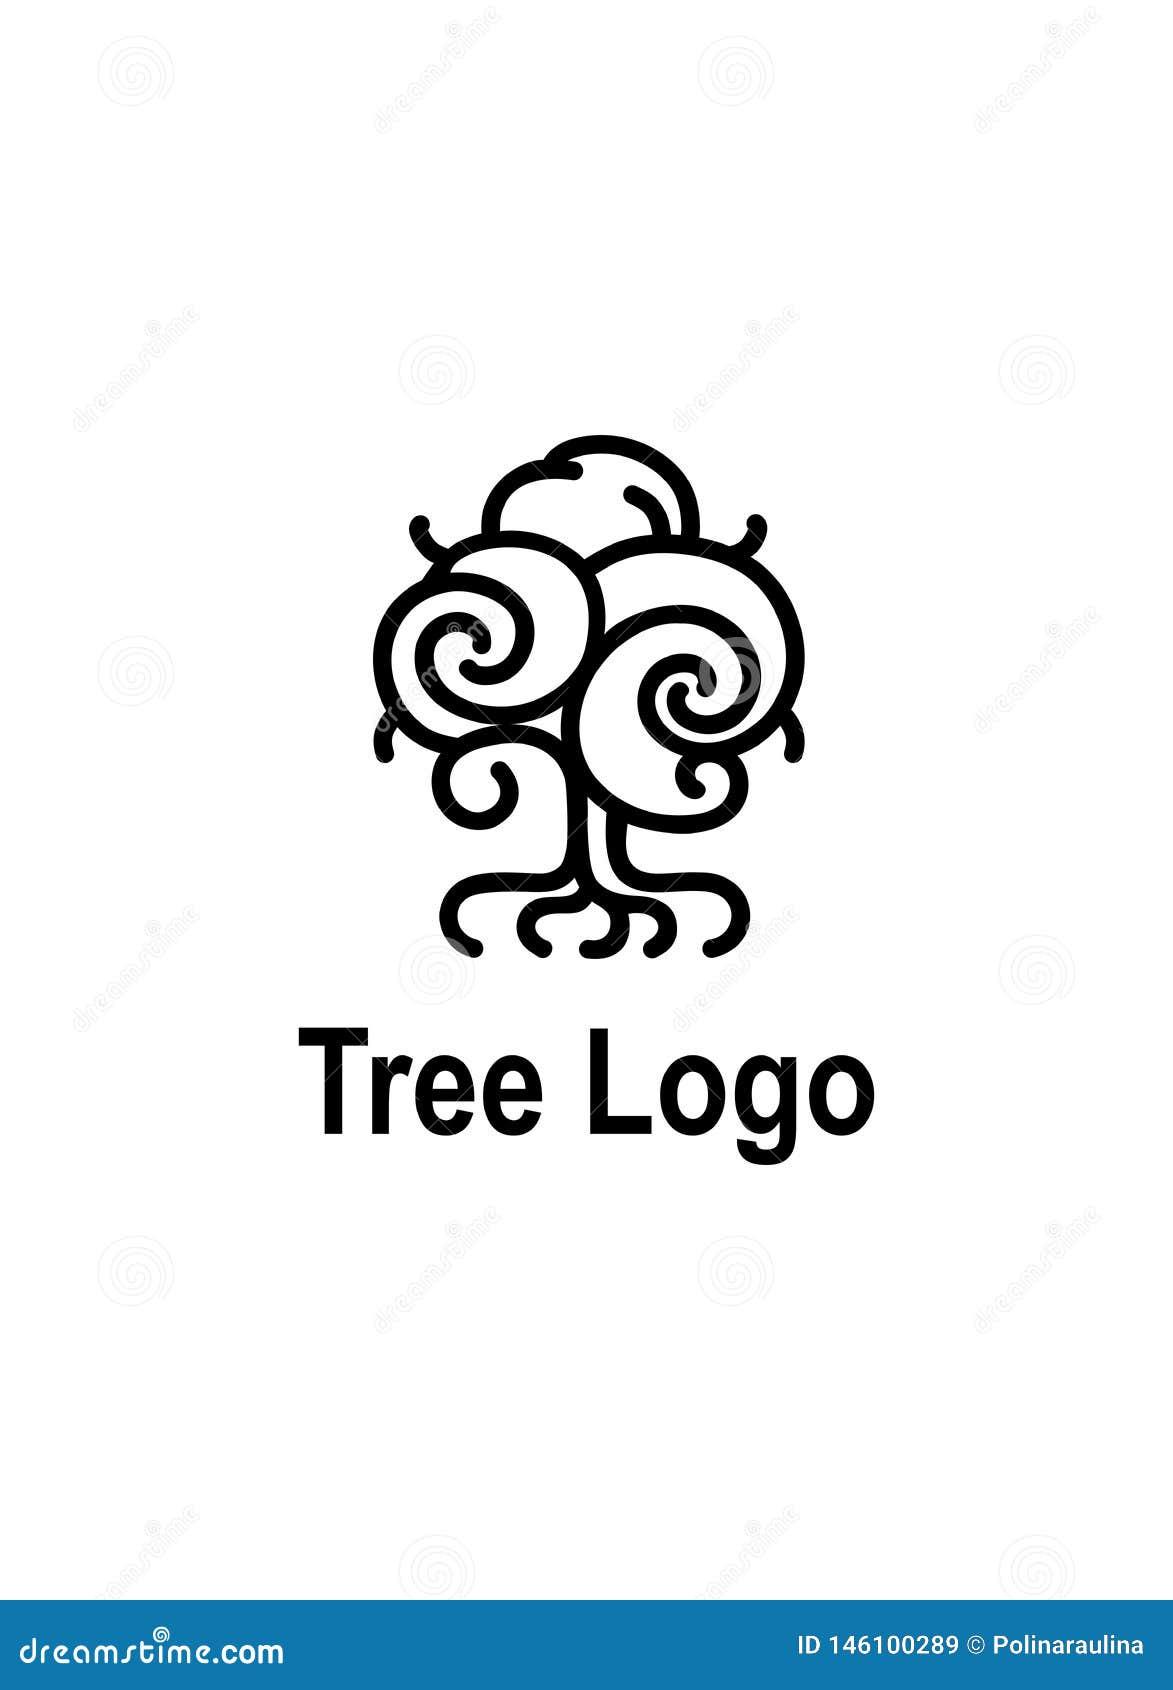 Trees Roots Logo Stock Illustrations – 20 Trees Roots Logo Stock ...